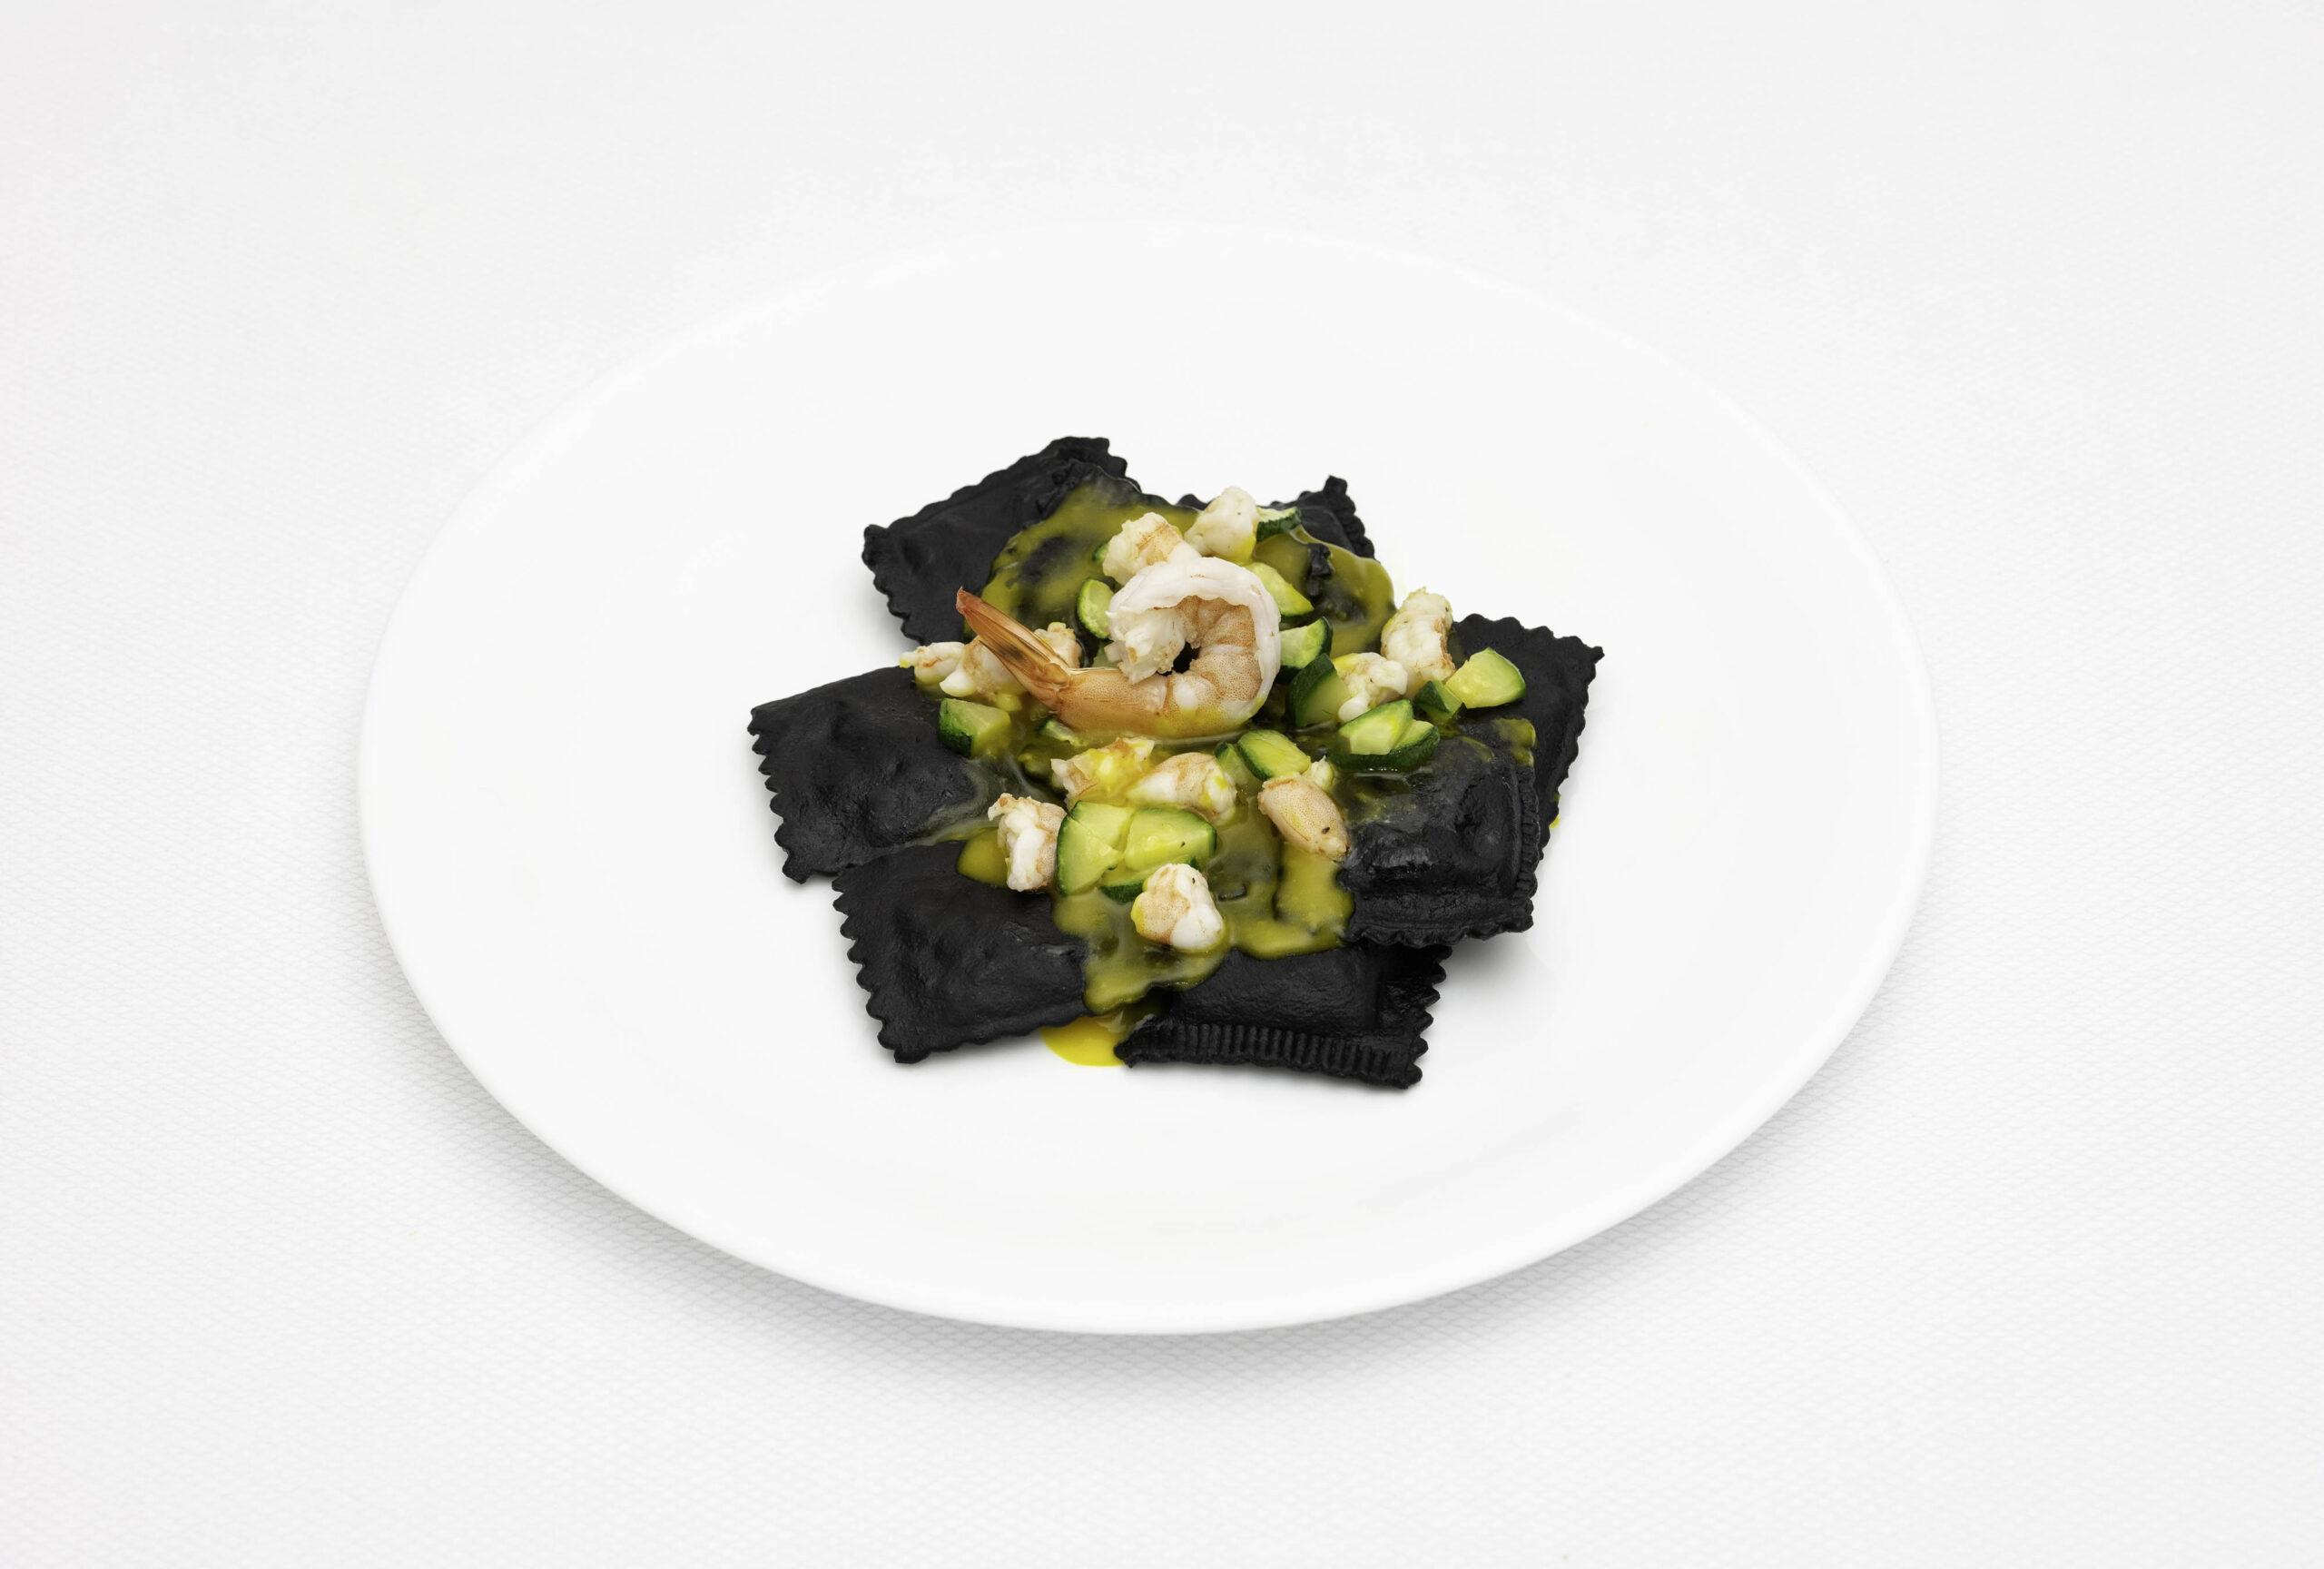 Pastifico-La-Fenice-pastificio-Cesenatico-pasta-fresca-pasta-surgelata-pasta-artigianale-Emilia-Romagna-Tortelli-neri-ai-crostacei